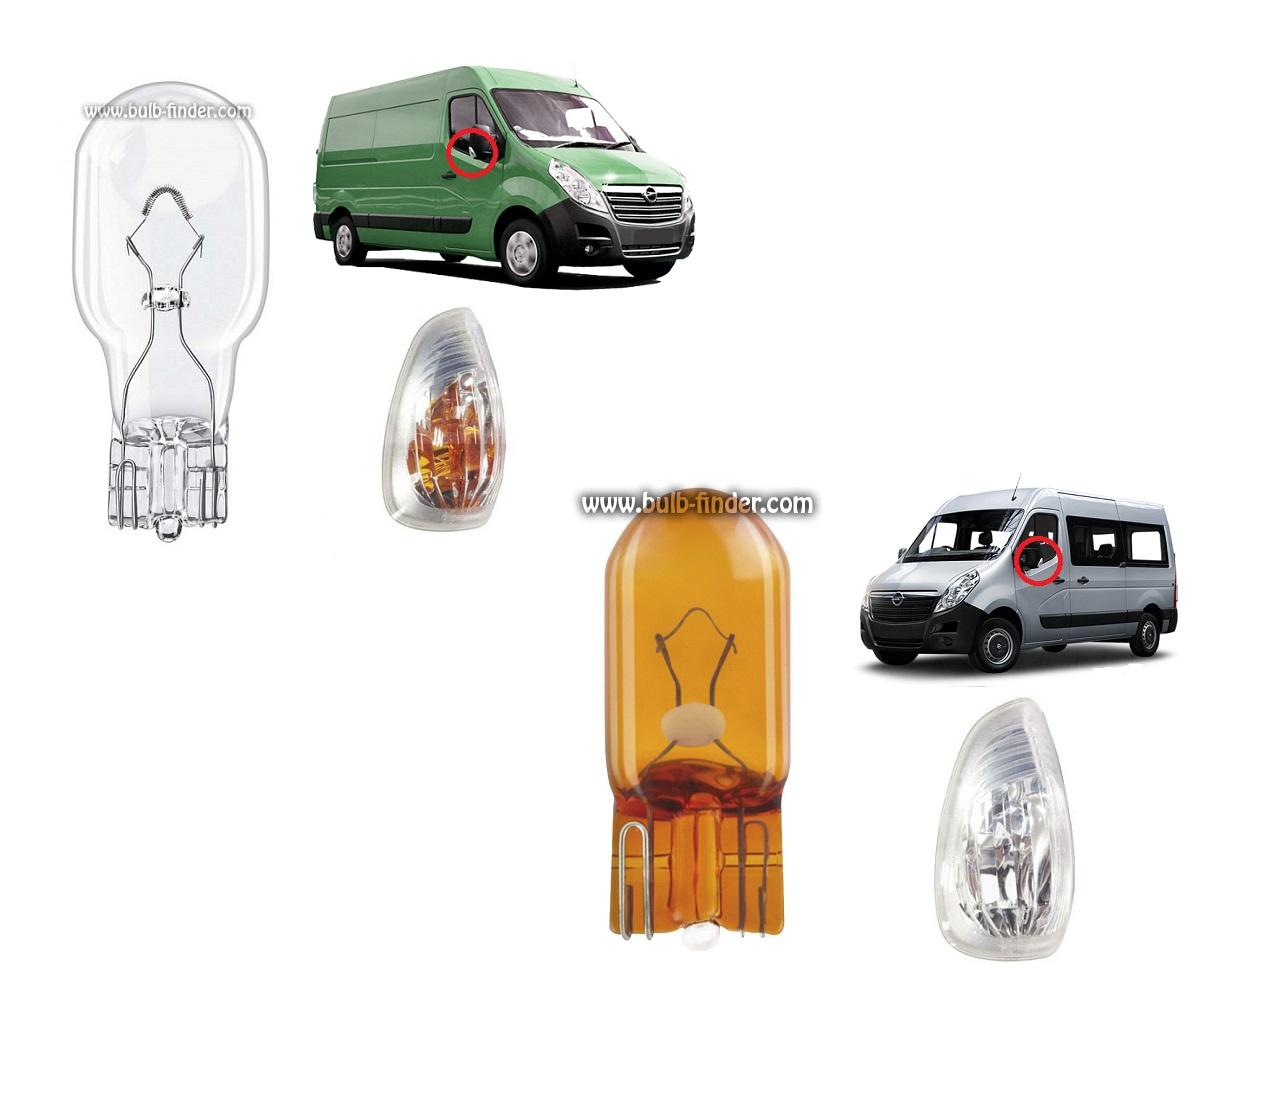 Opel Movano II bulbs specification for halogen headlamp